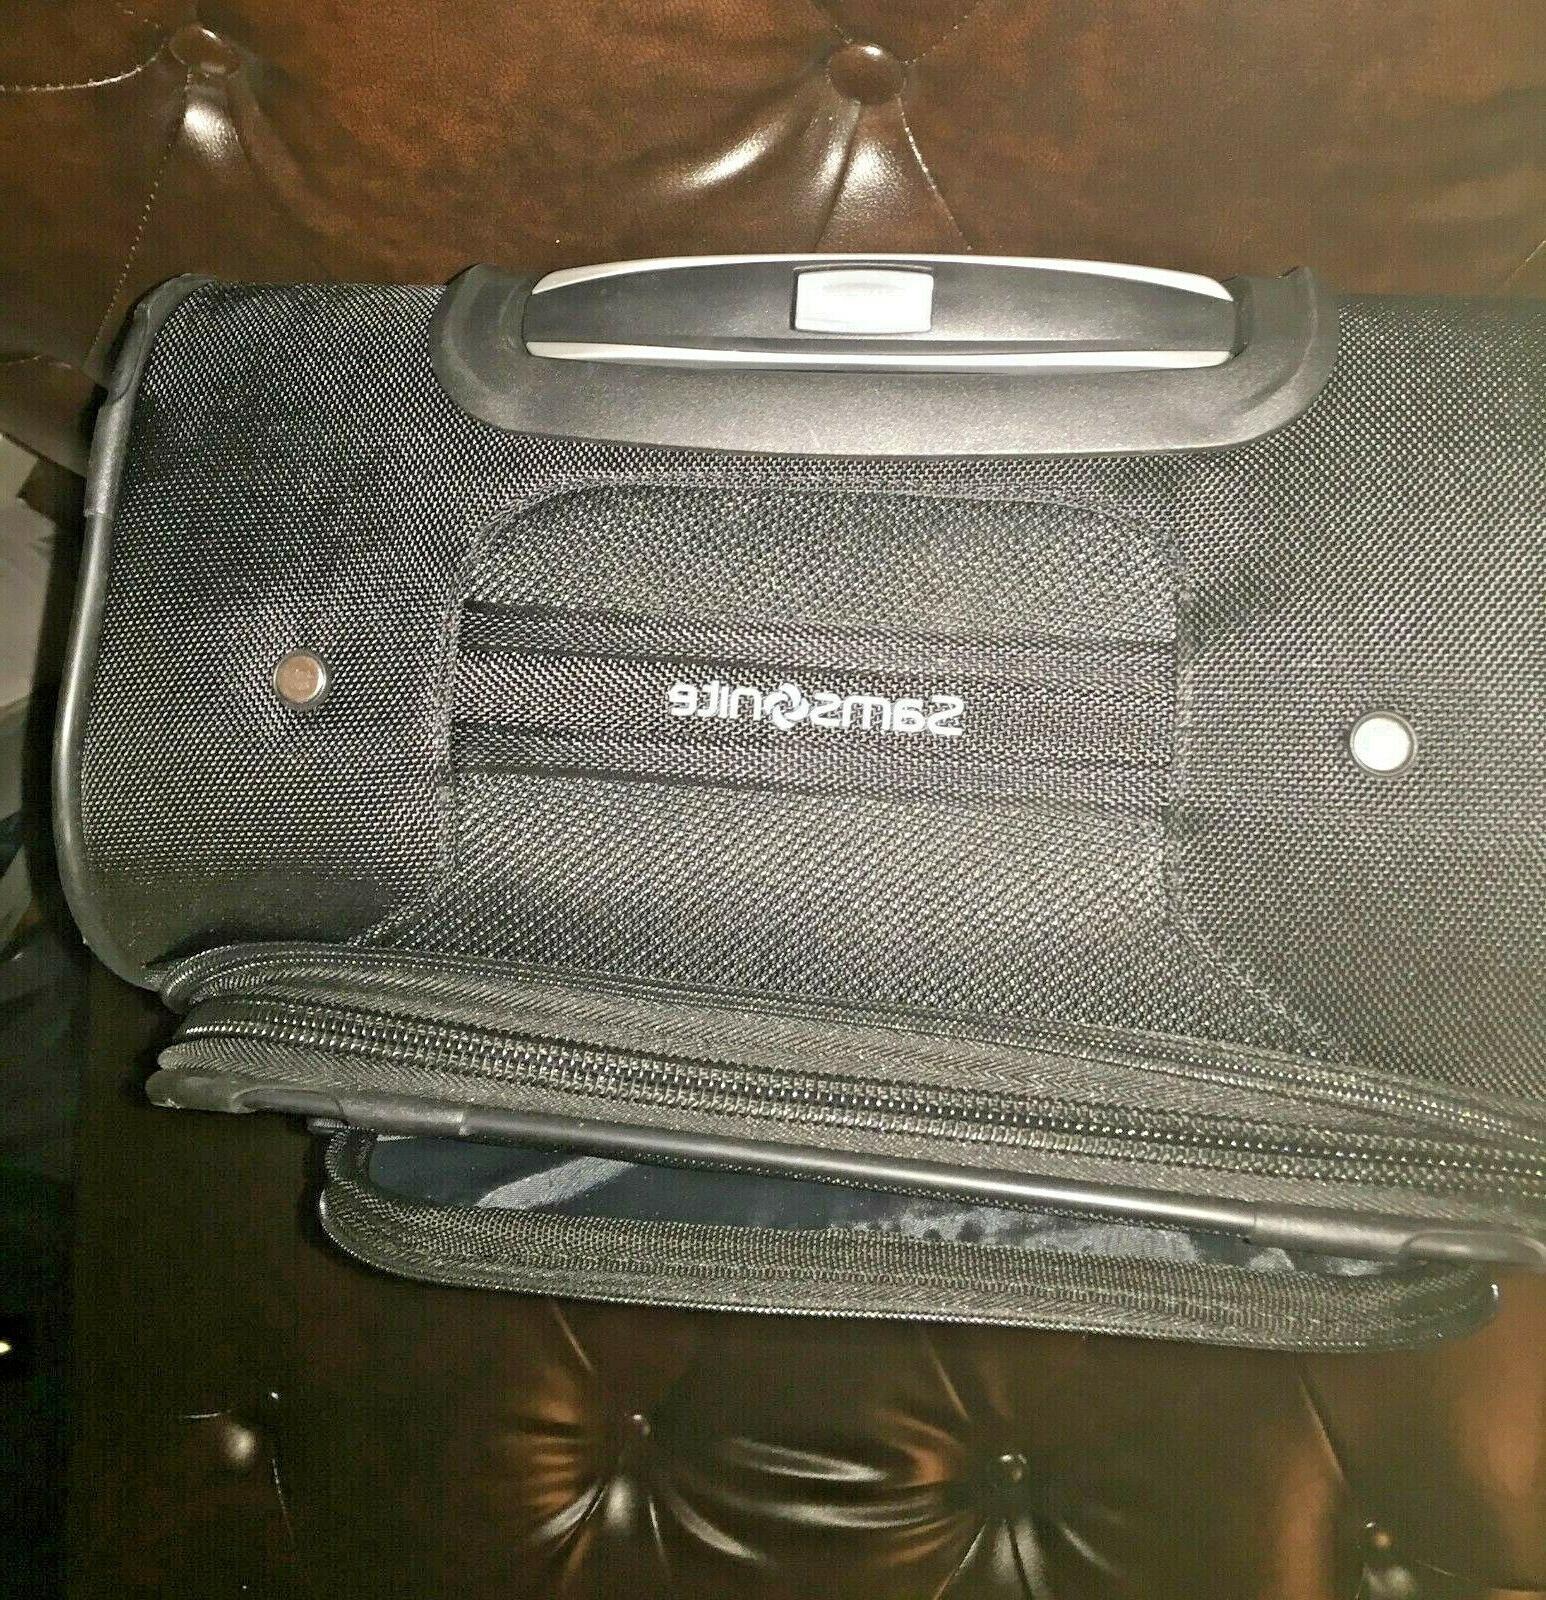 Samsonite Softside Luggage with Spinner Wheels,